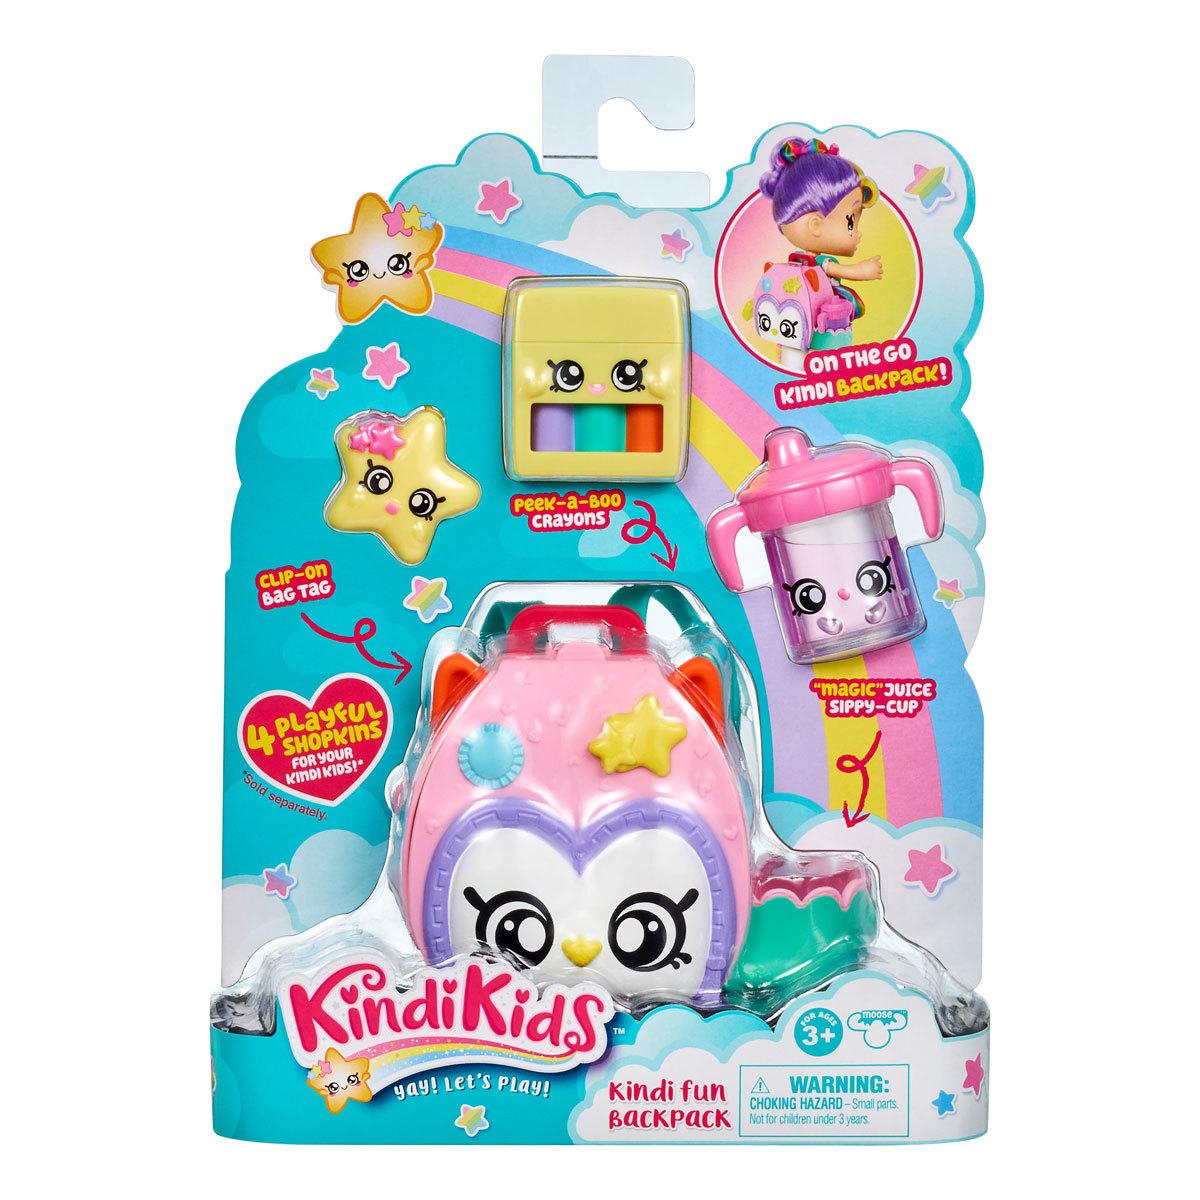 Kindi Kids Owl Petkin Sac à dos et 3 Shopkins